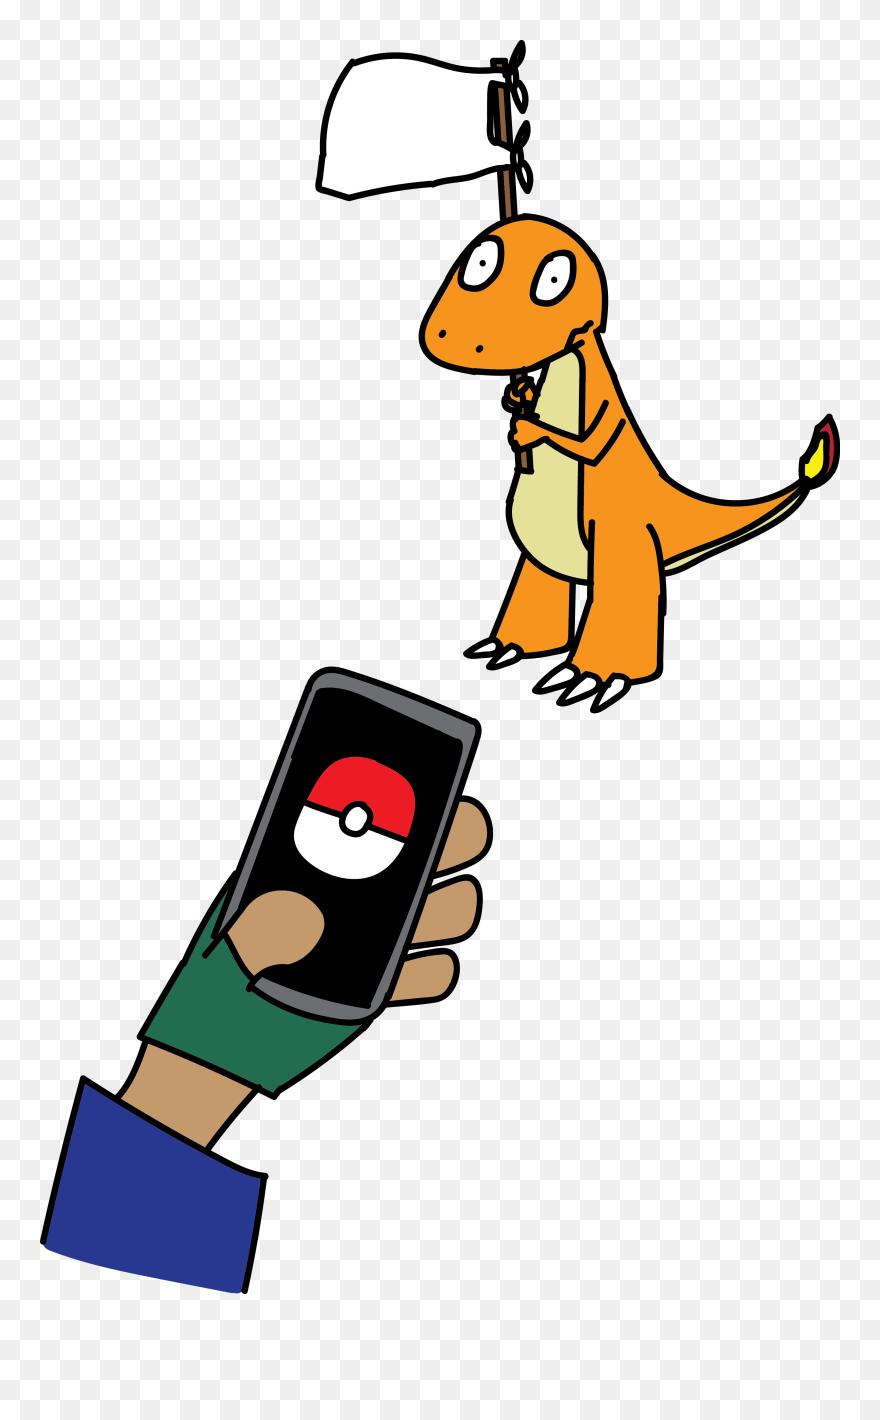 Fishing Rod Clipart Pokemon Cartoon Png Download 5218616 Pinclipart